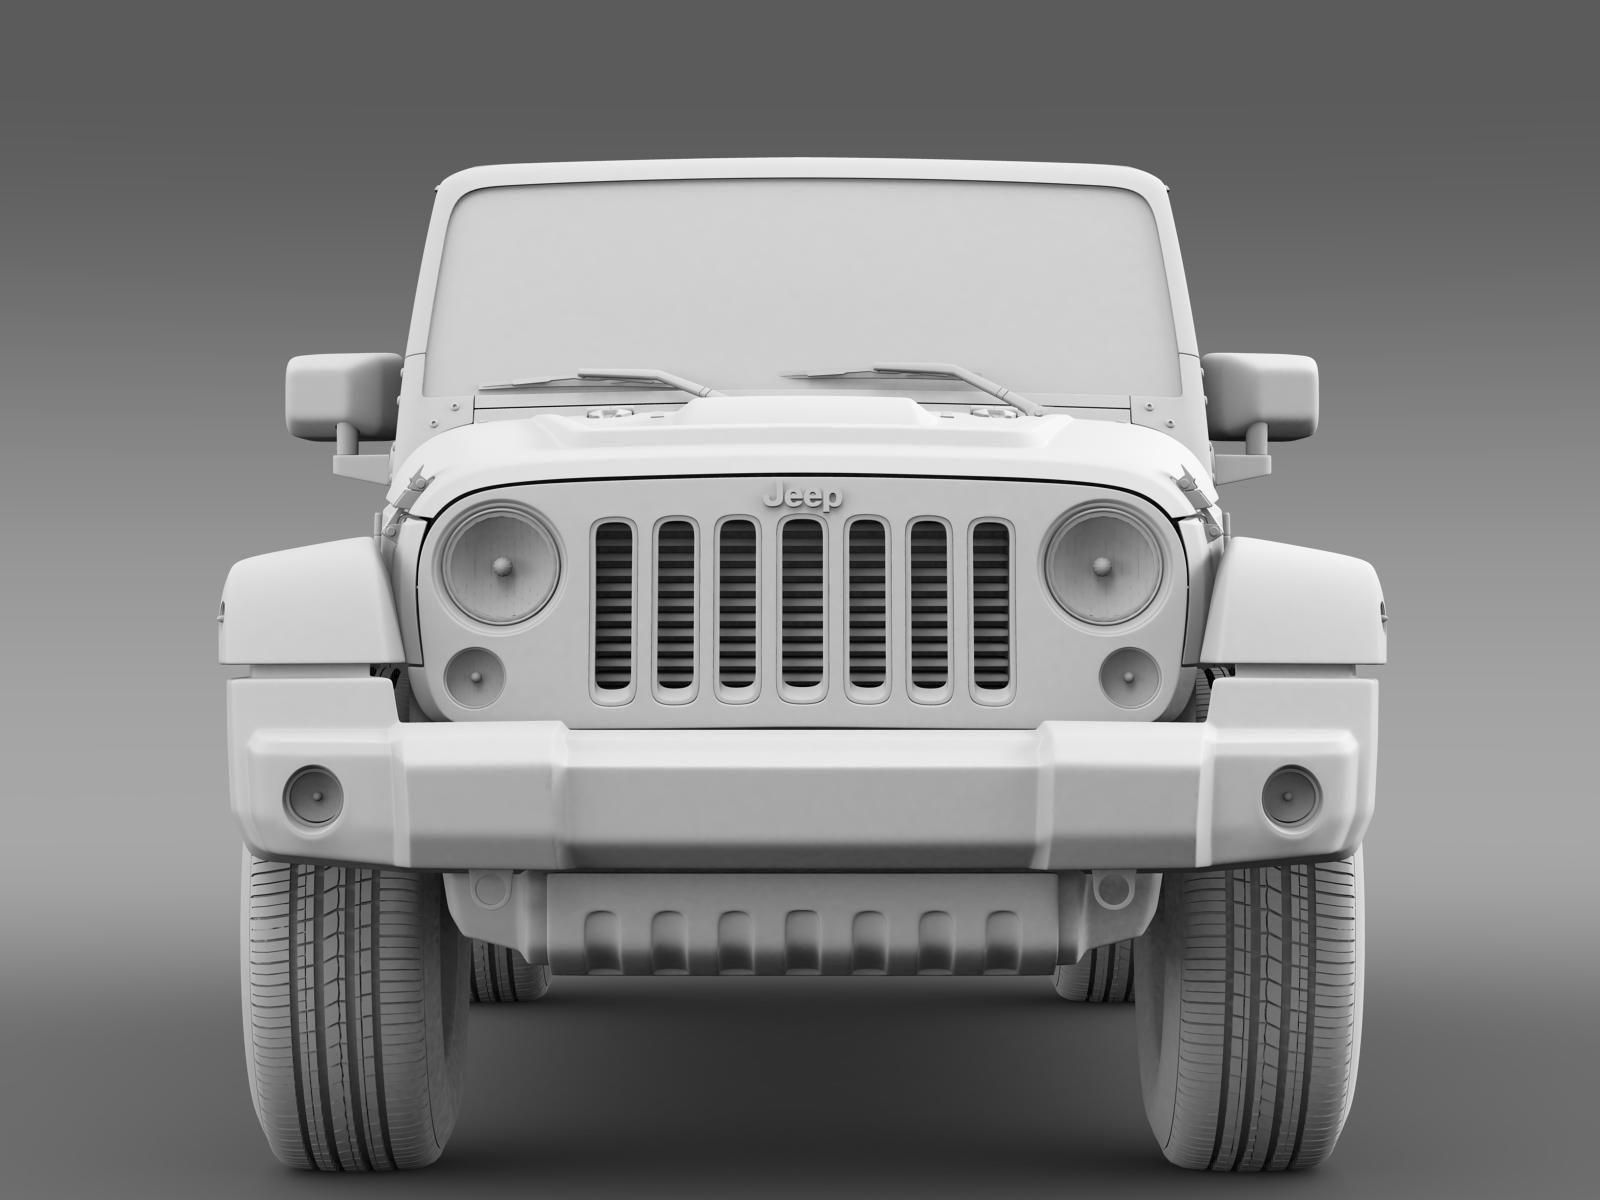 jeep wrangler black edition 2 2015 3d model max obj 3ds fbx c4d lwo lw lws